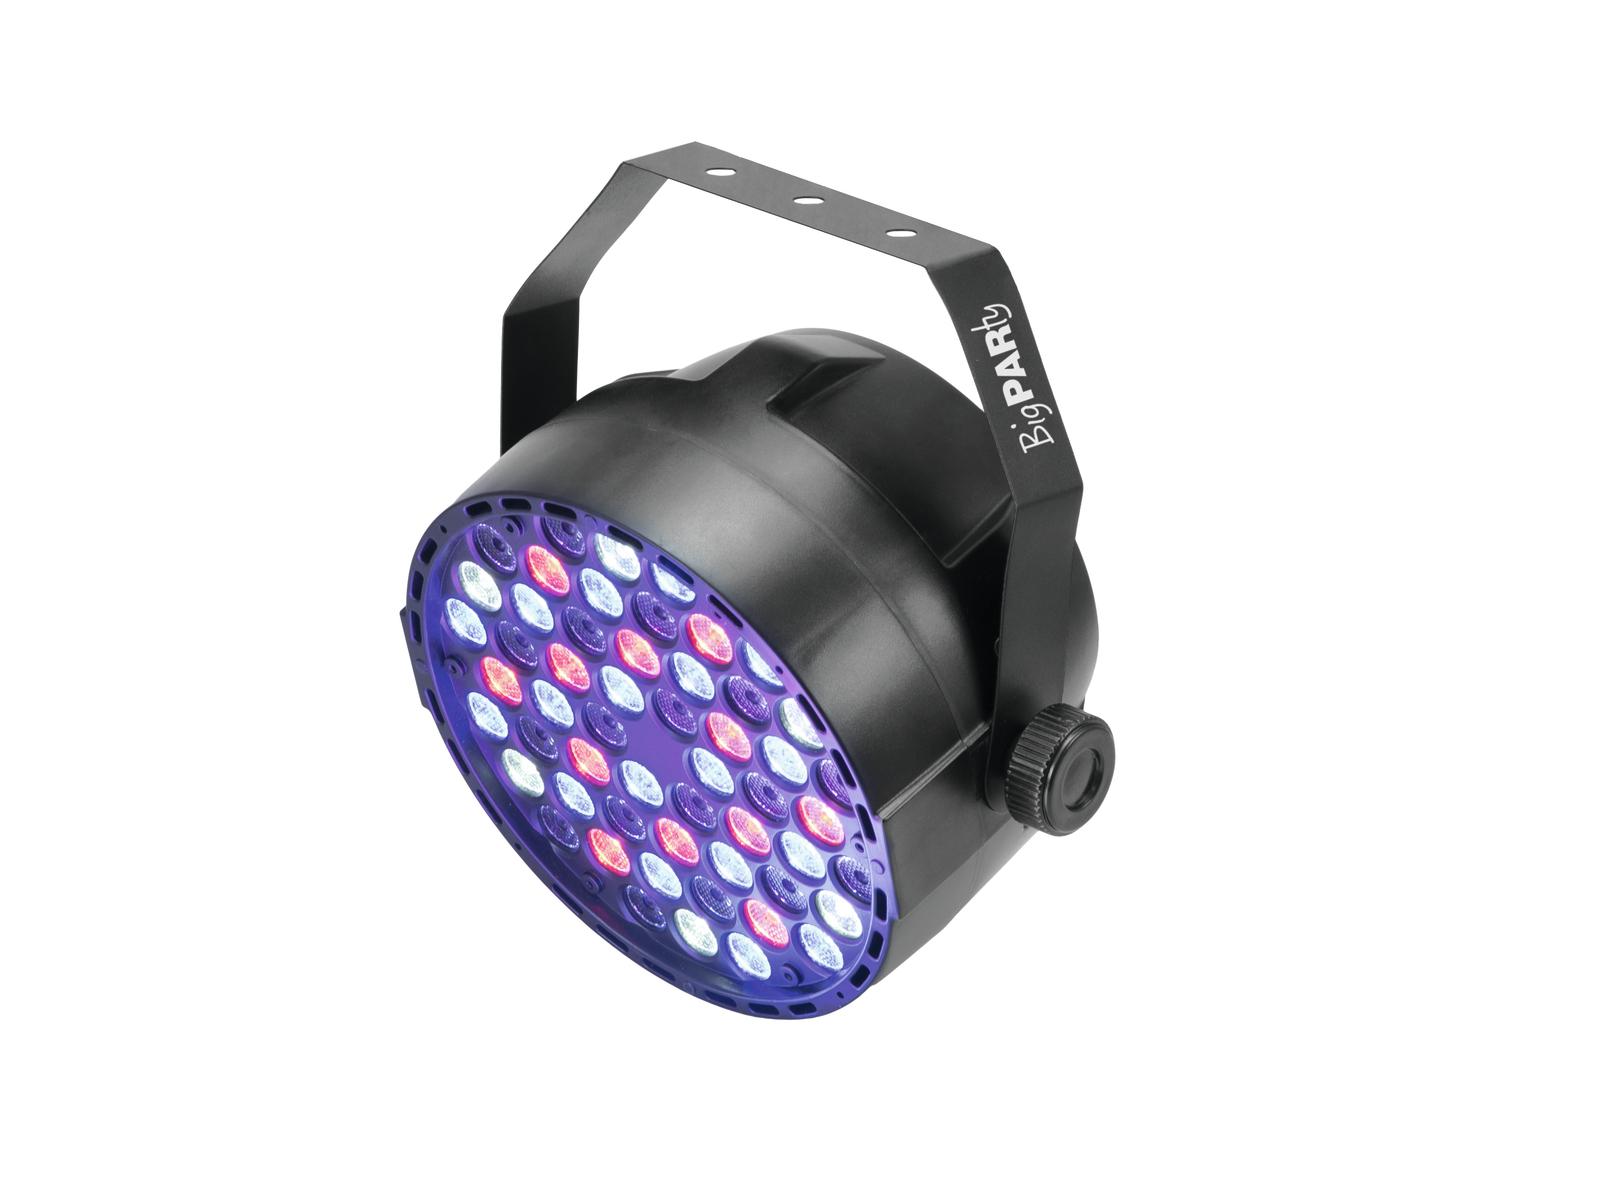 Eurolite LED Big Party Spot, 54x 1W RGBW LED, DMX